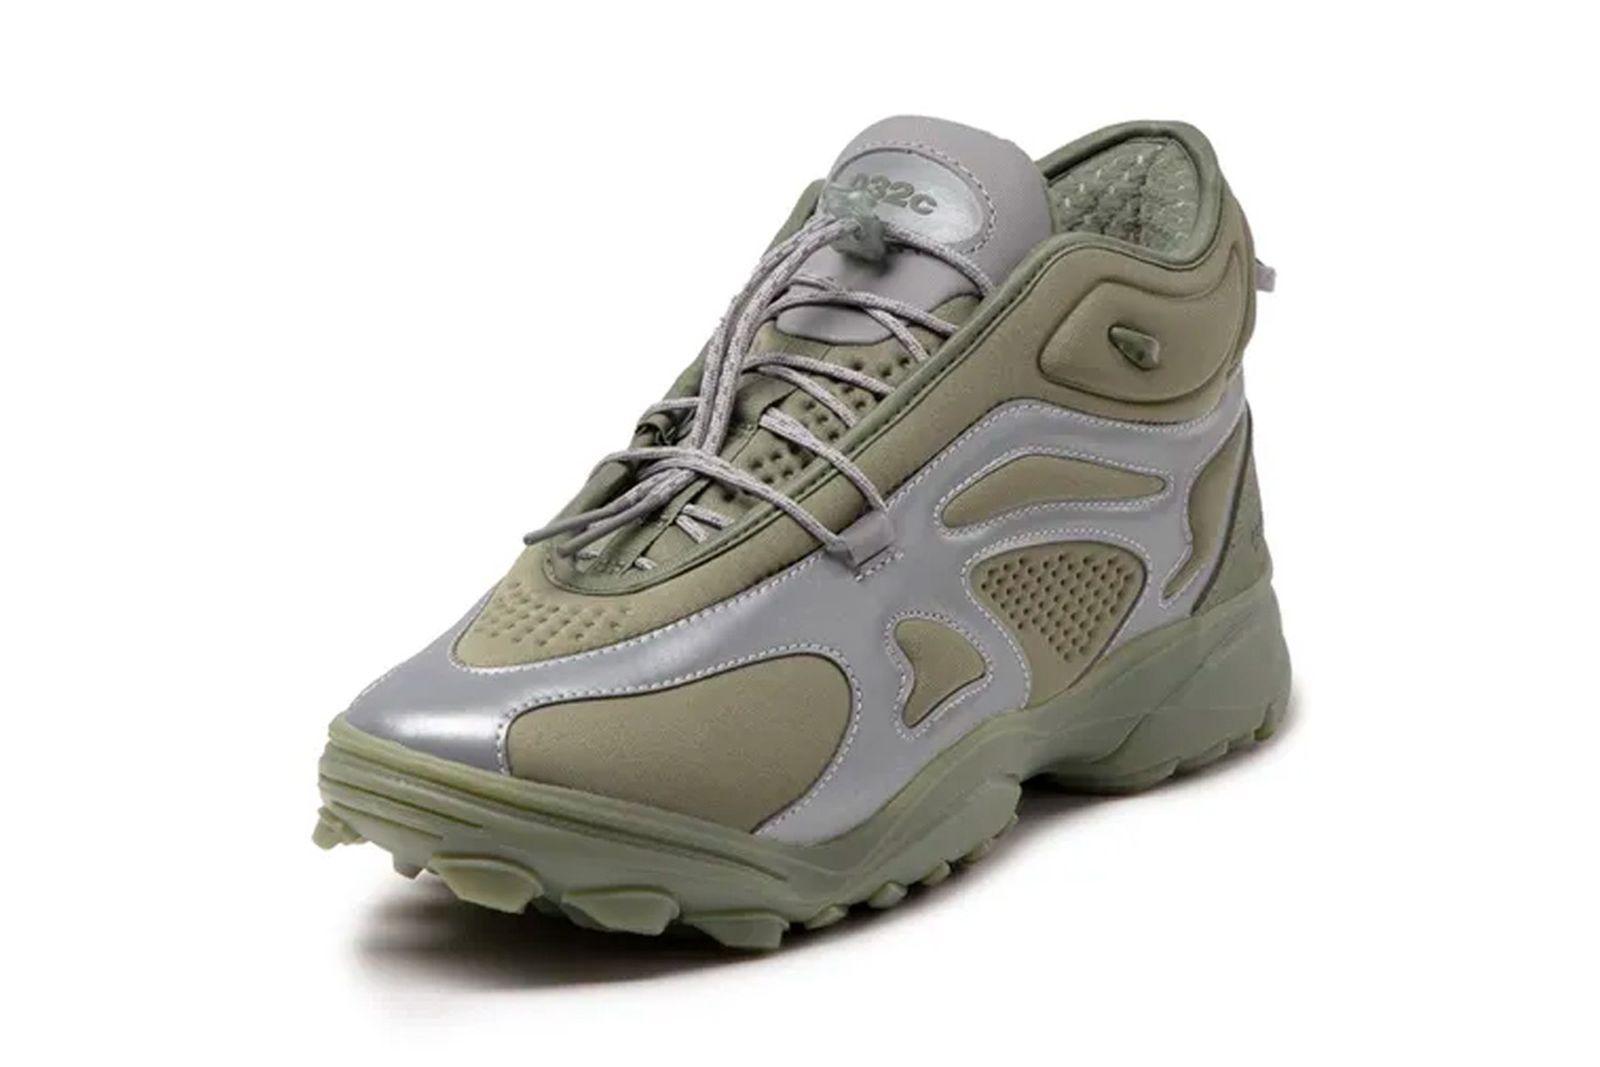 032c-adidas-gsg-running-tr-gsg-mule-release-date-price-02